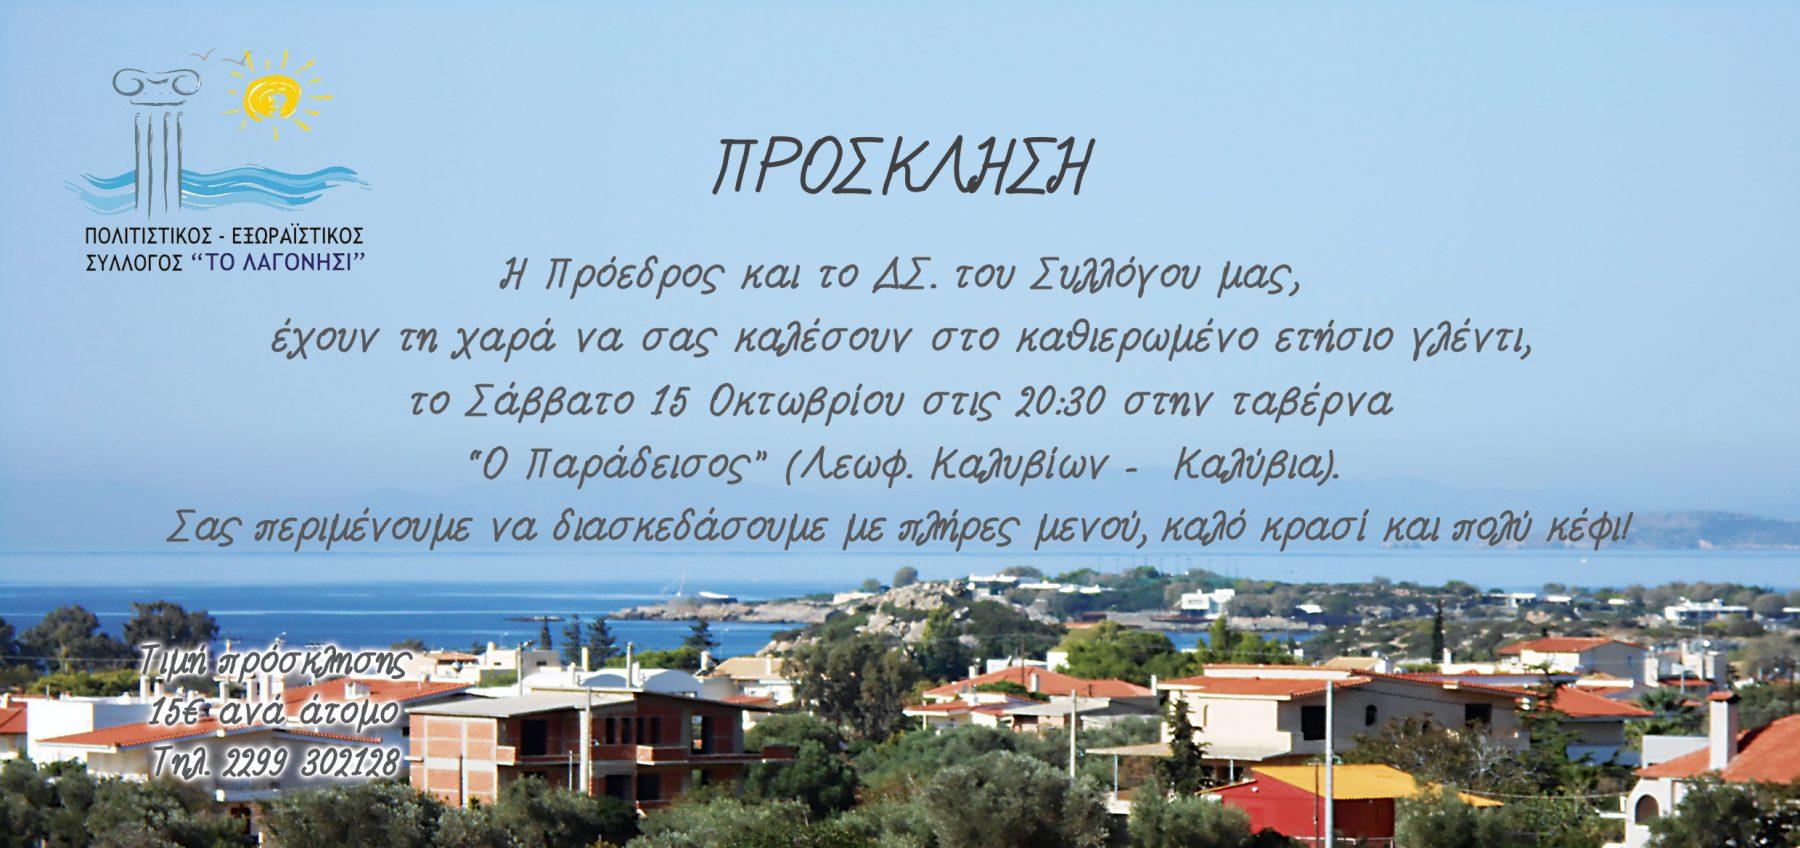 prosklhs-septembrios-2016-syllogos-lagonhsou